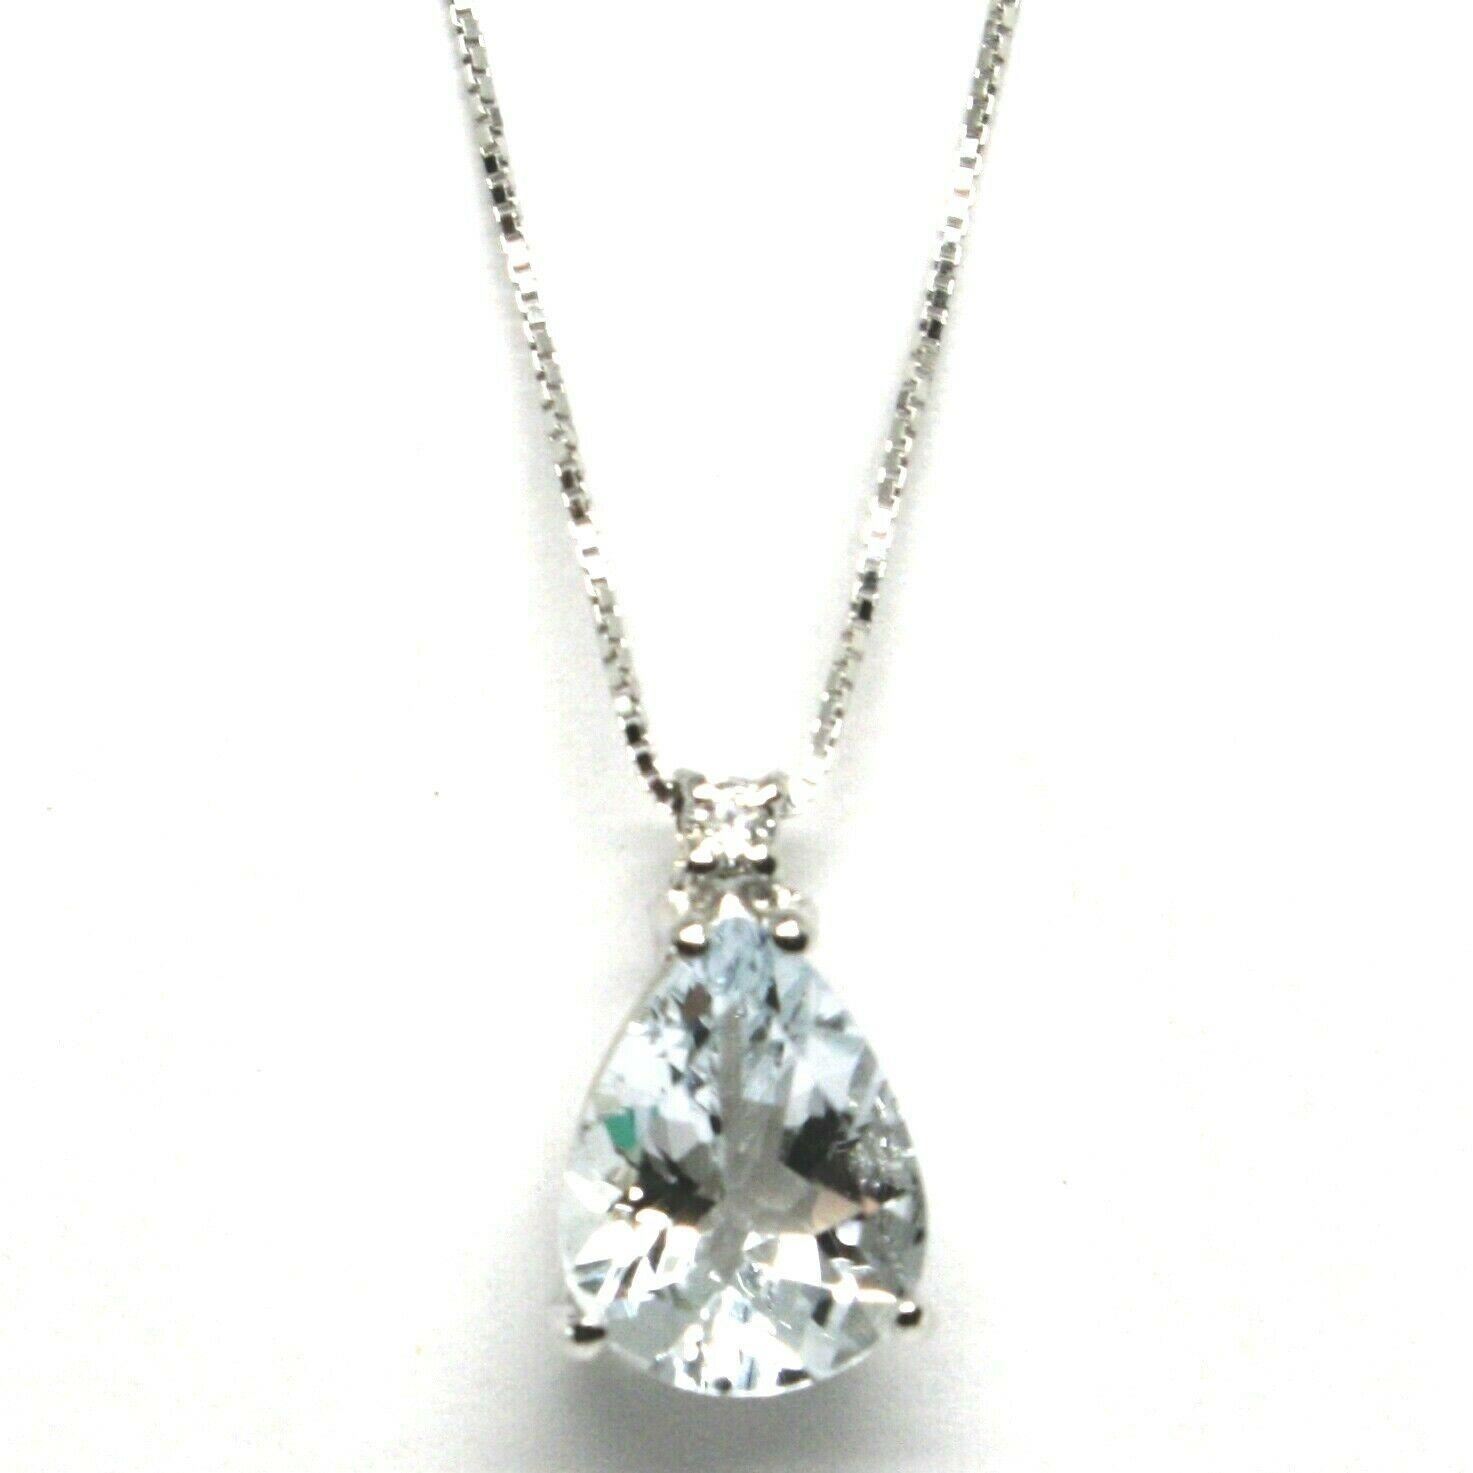 Collar con Colgante Oro Blanco 750 18K, Aguamarina Talla 16 Gota, Diamante